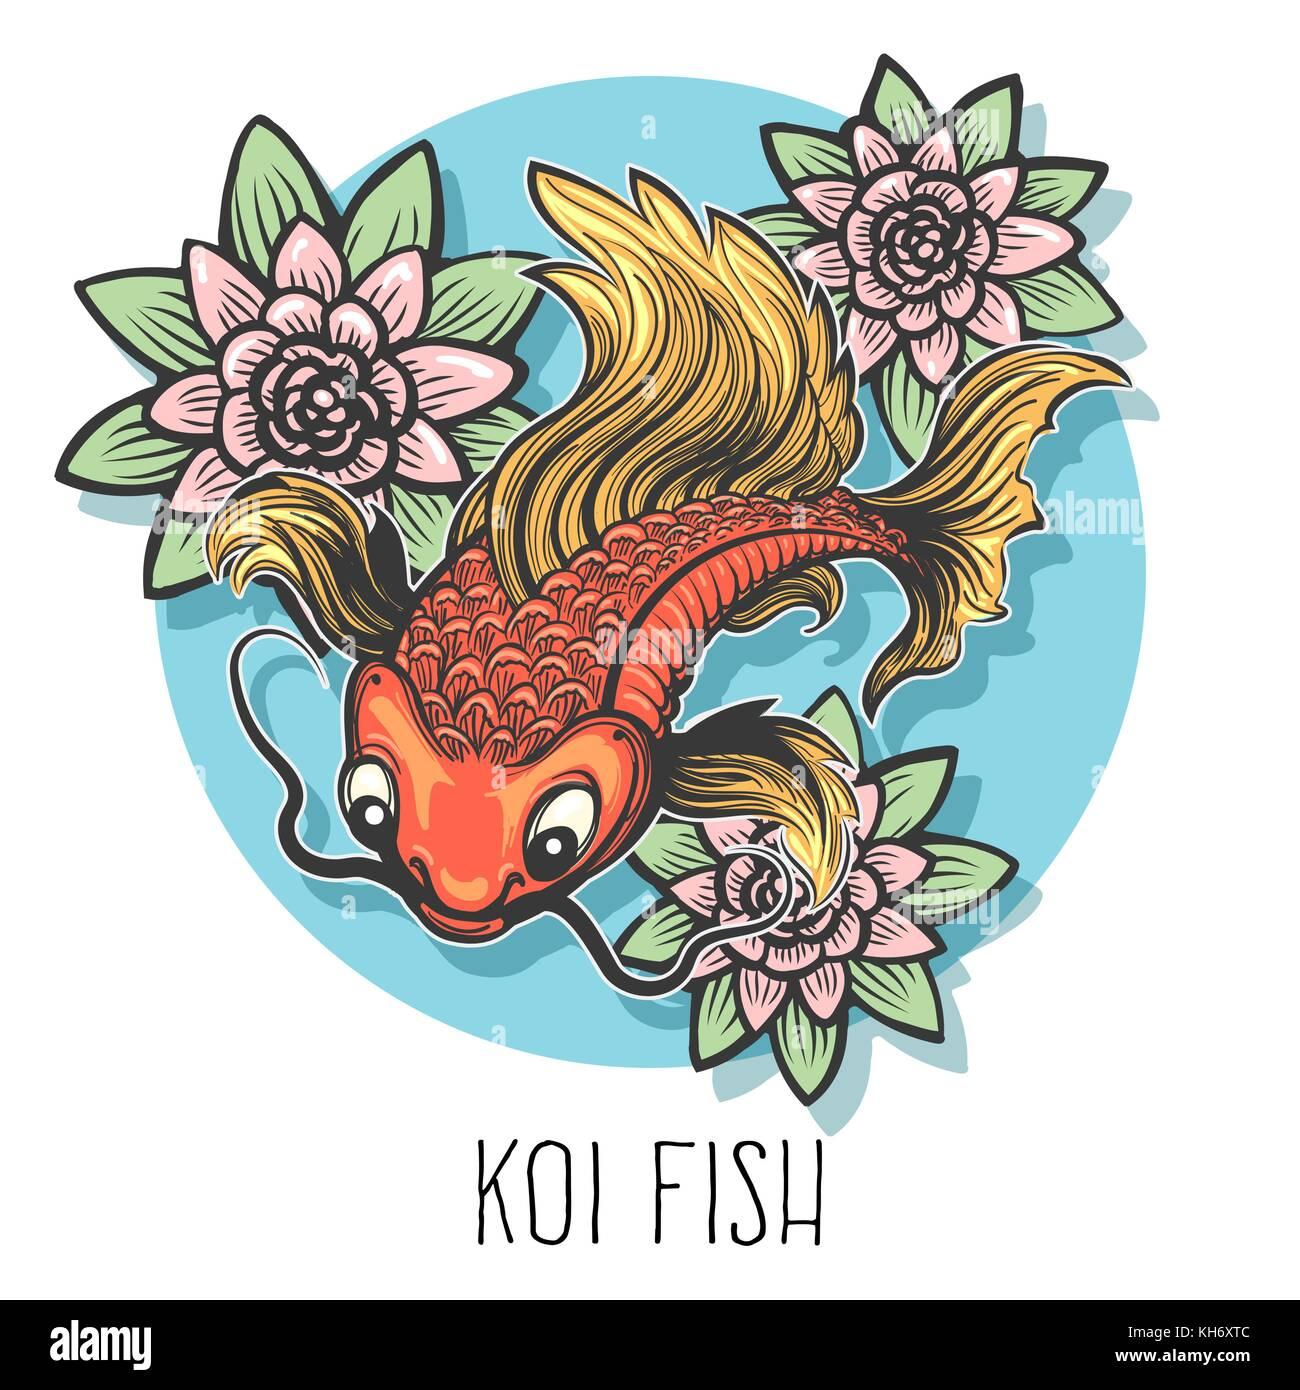 Hand drawn carp fish with lotus flowers drawn in tattoo style stock hand drawn carp fish with lotus flowers drawn in tattoo style isolated on white vector illustration izmirmasajfo Images